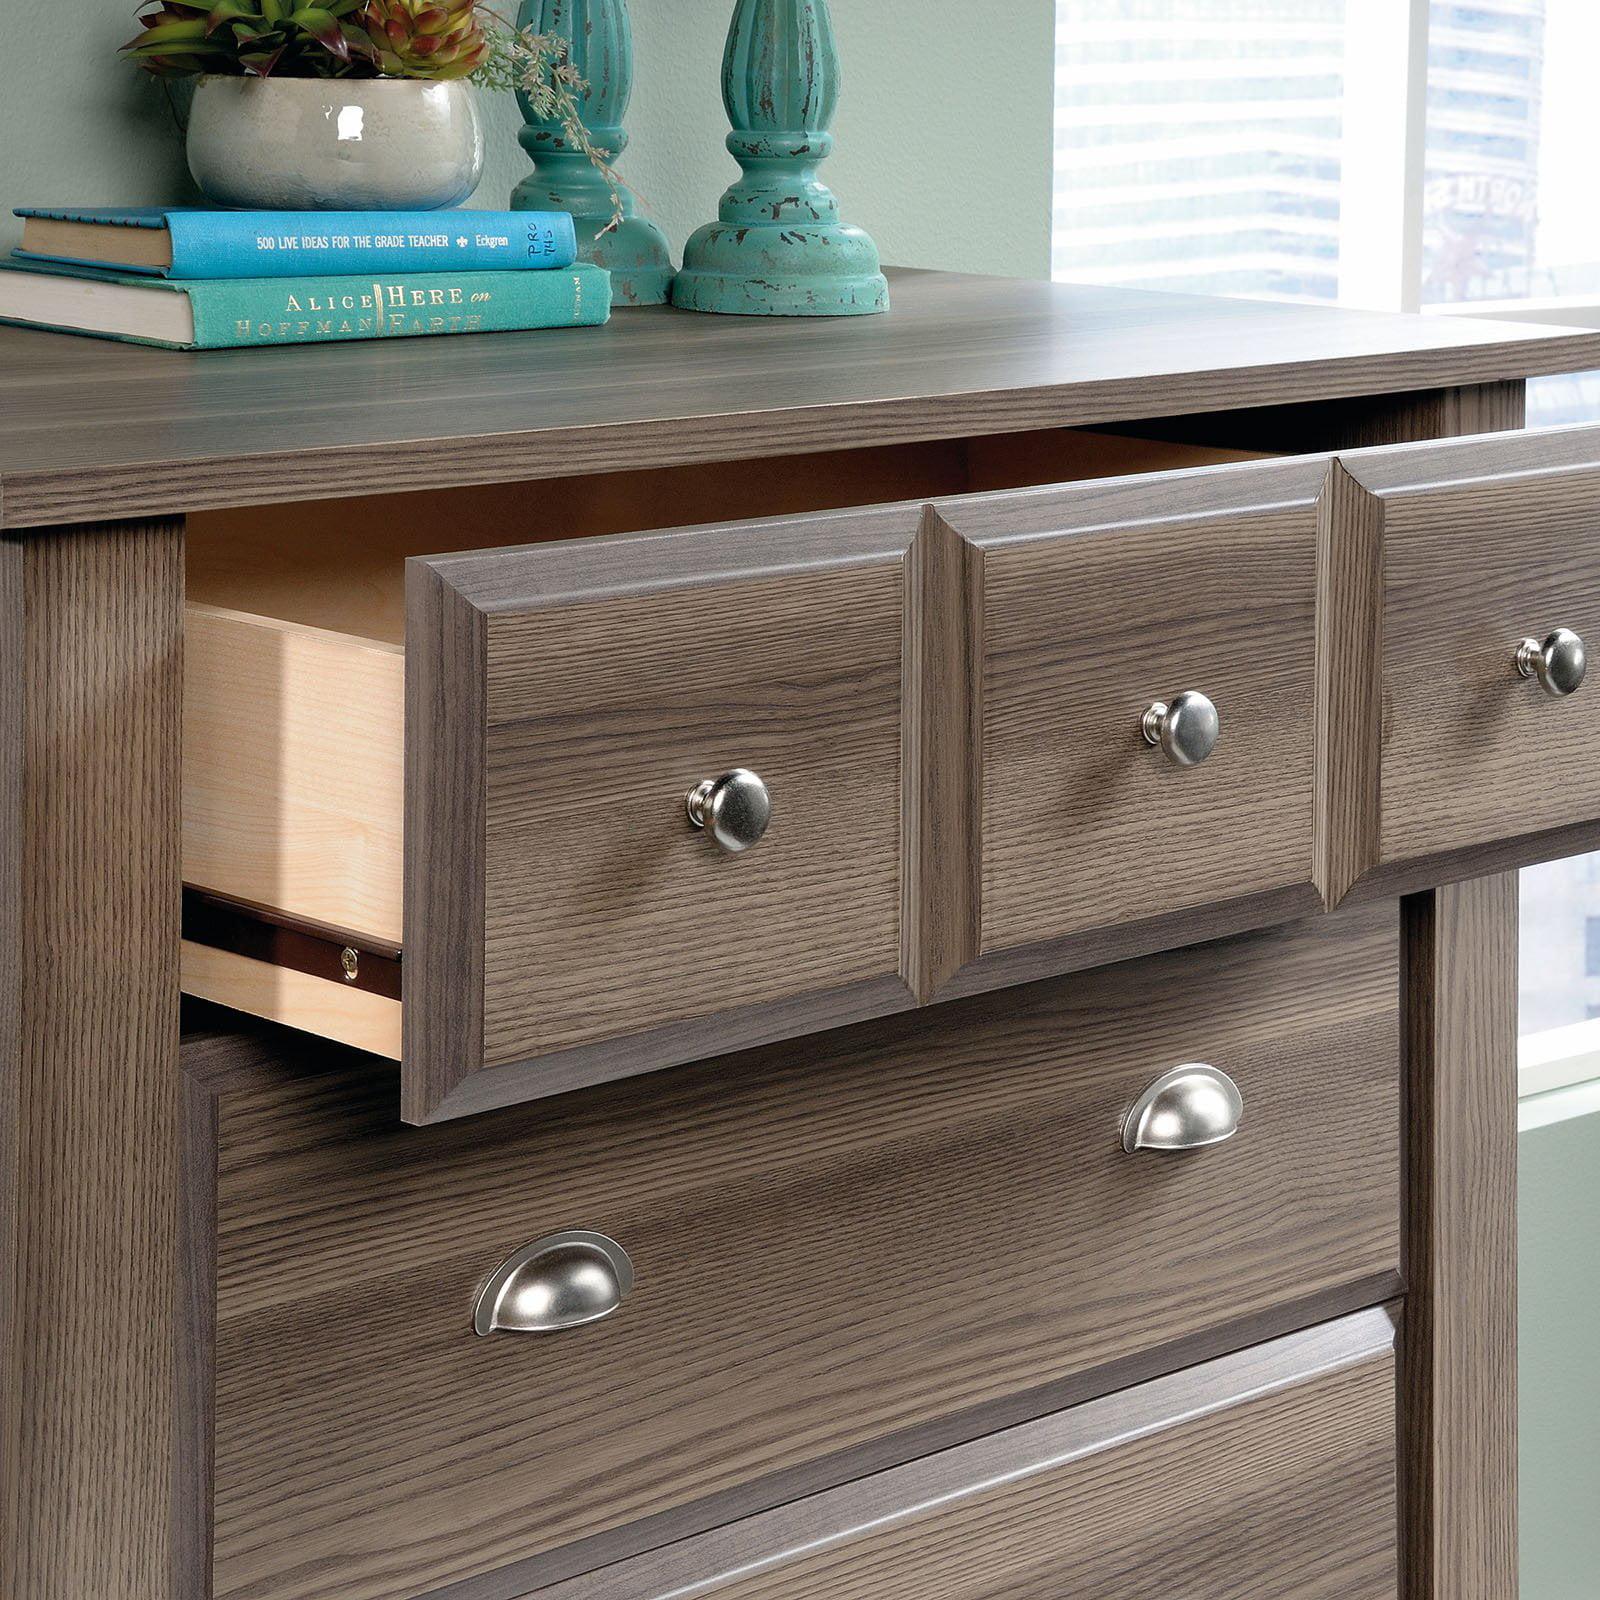 Sauder Shoal Creek 4 Drawer Dresser, Multiple Colors   Walmart.com